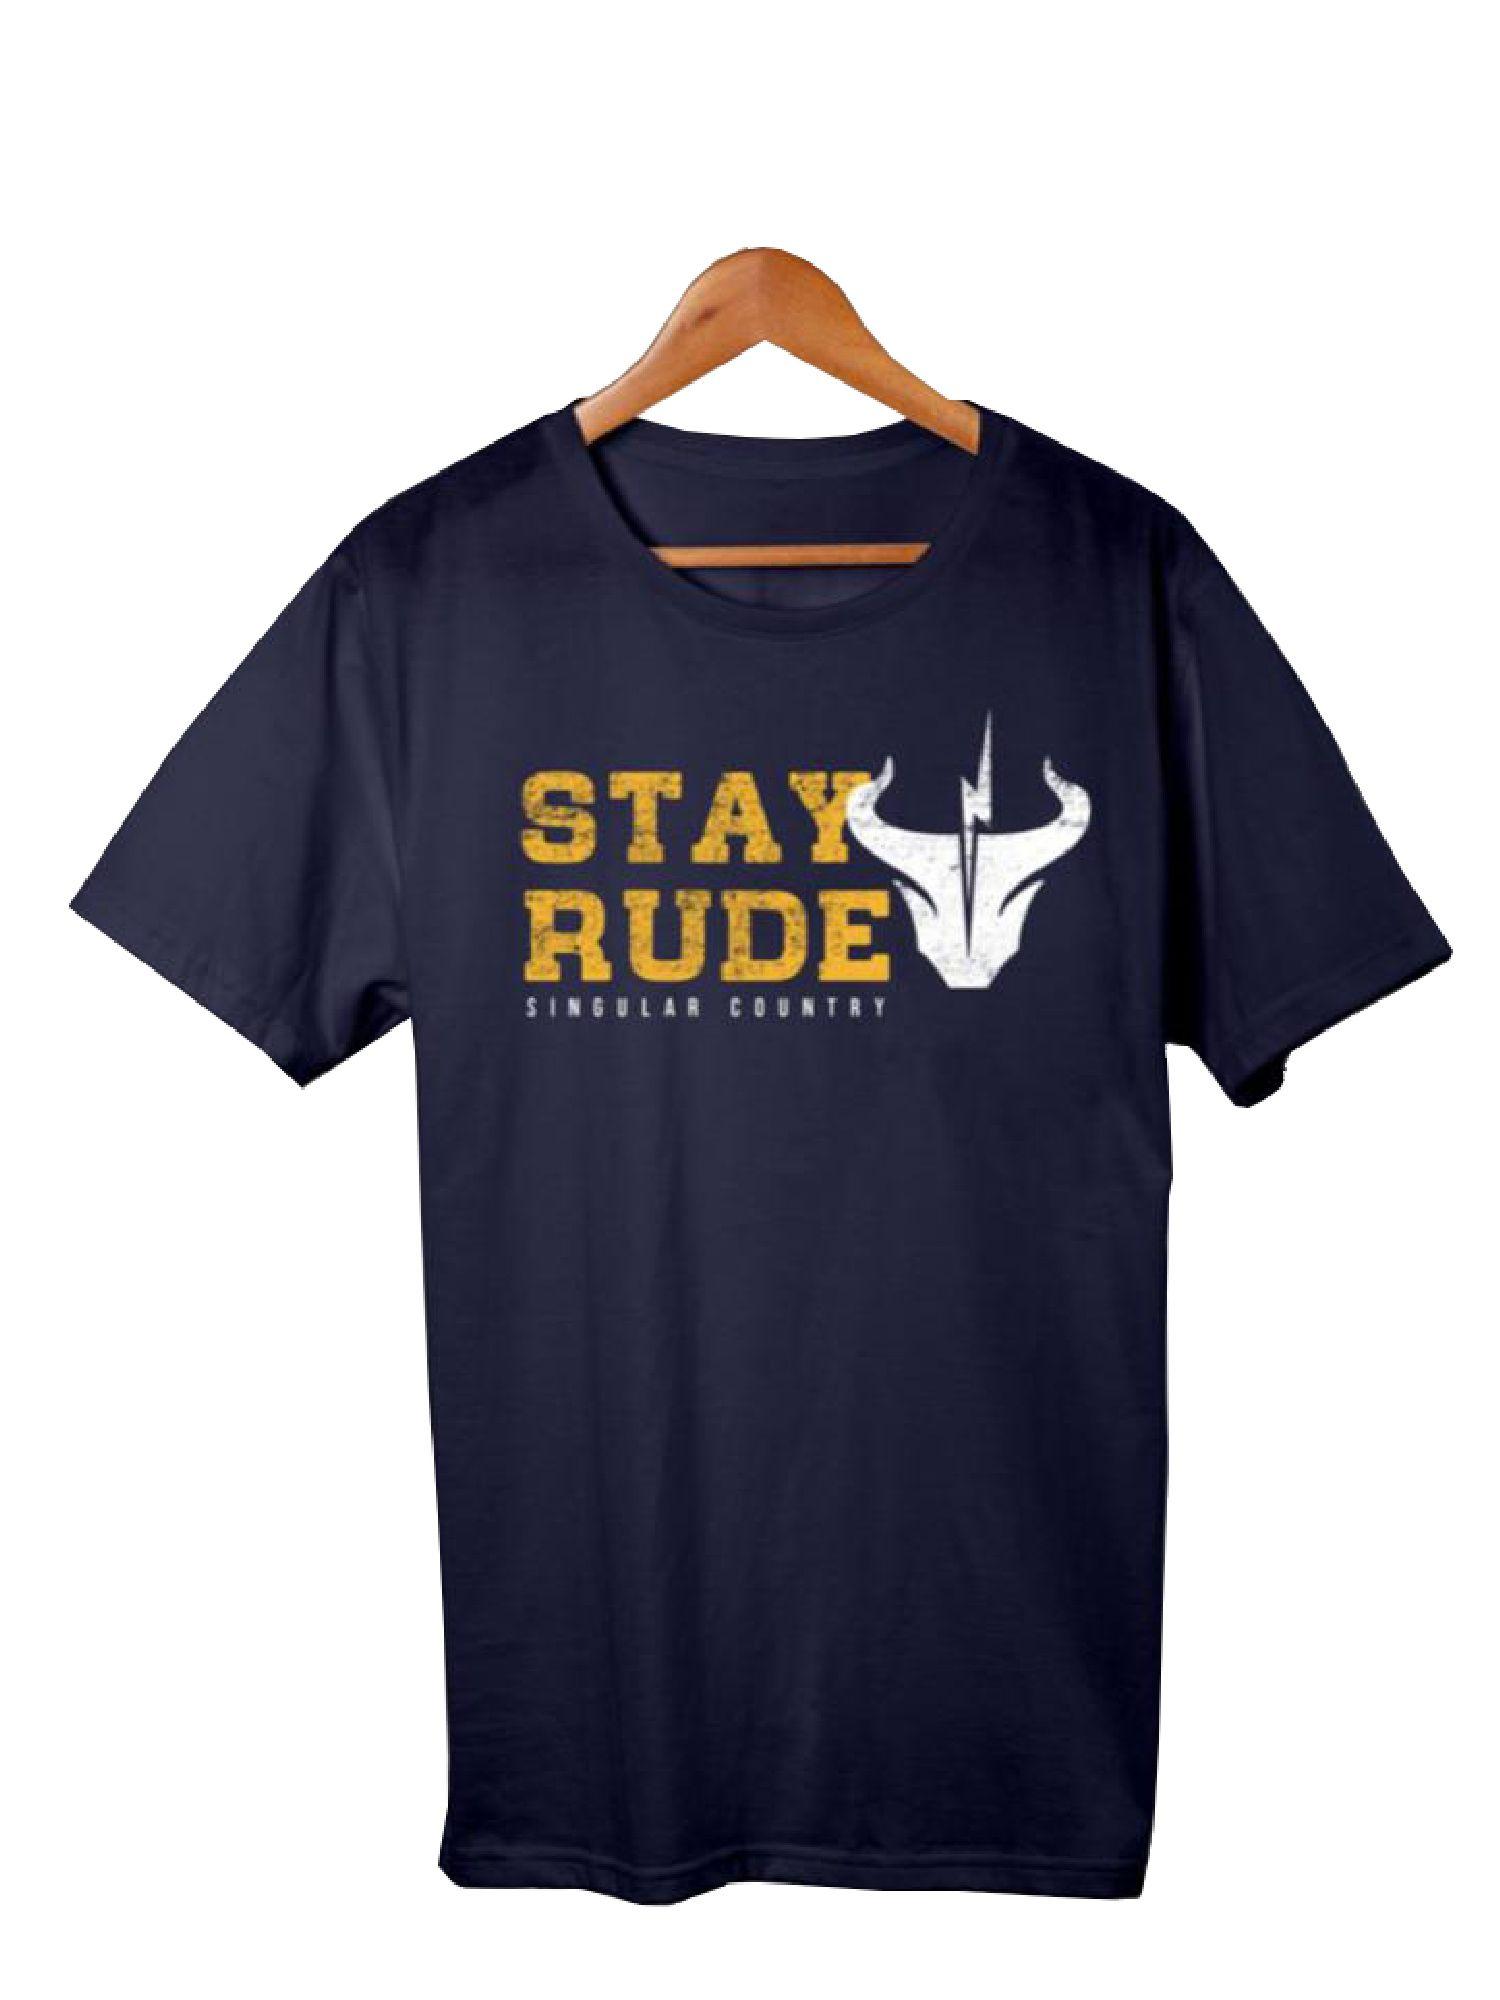 Camiseta Masculina Stay Rude Singular Country Azul Marinho